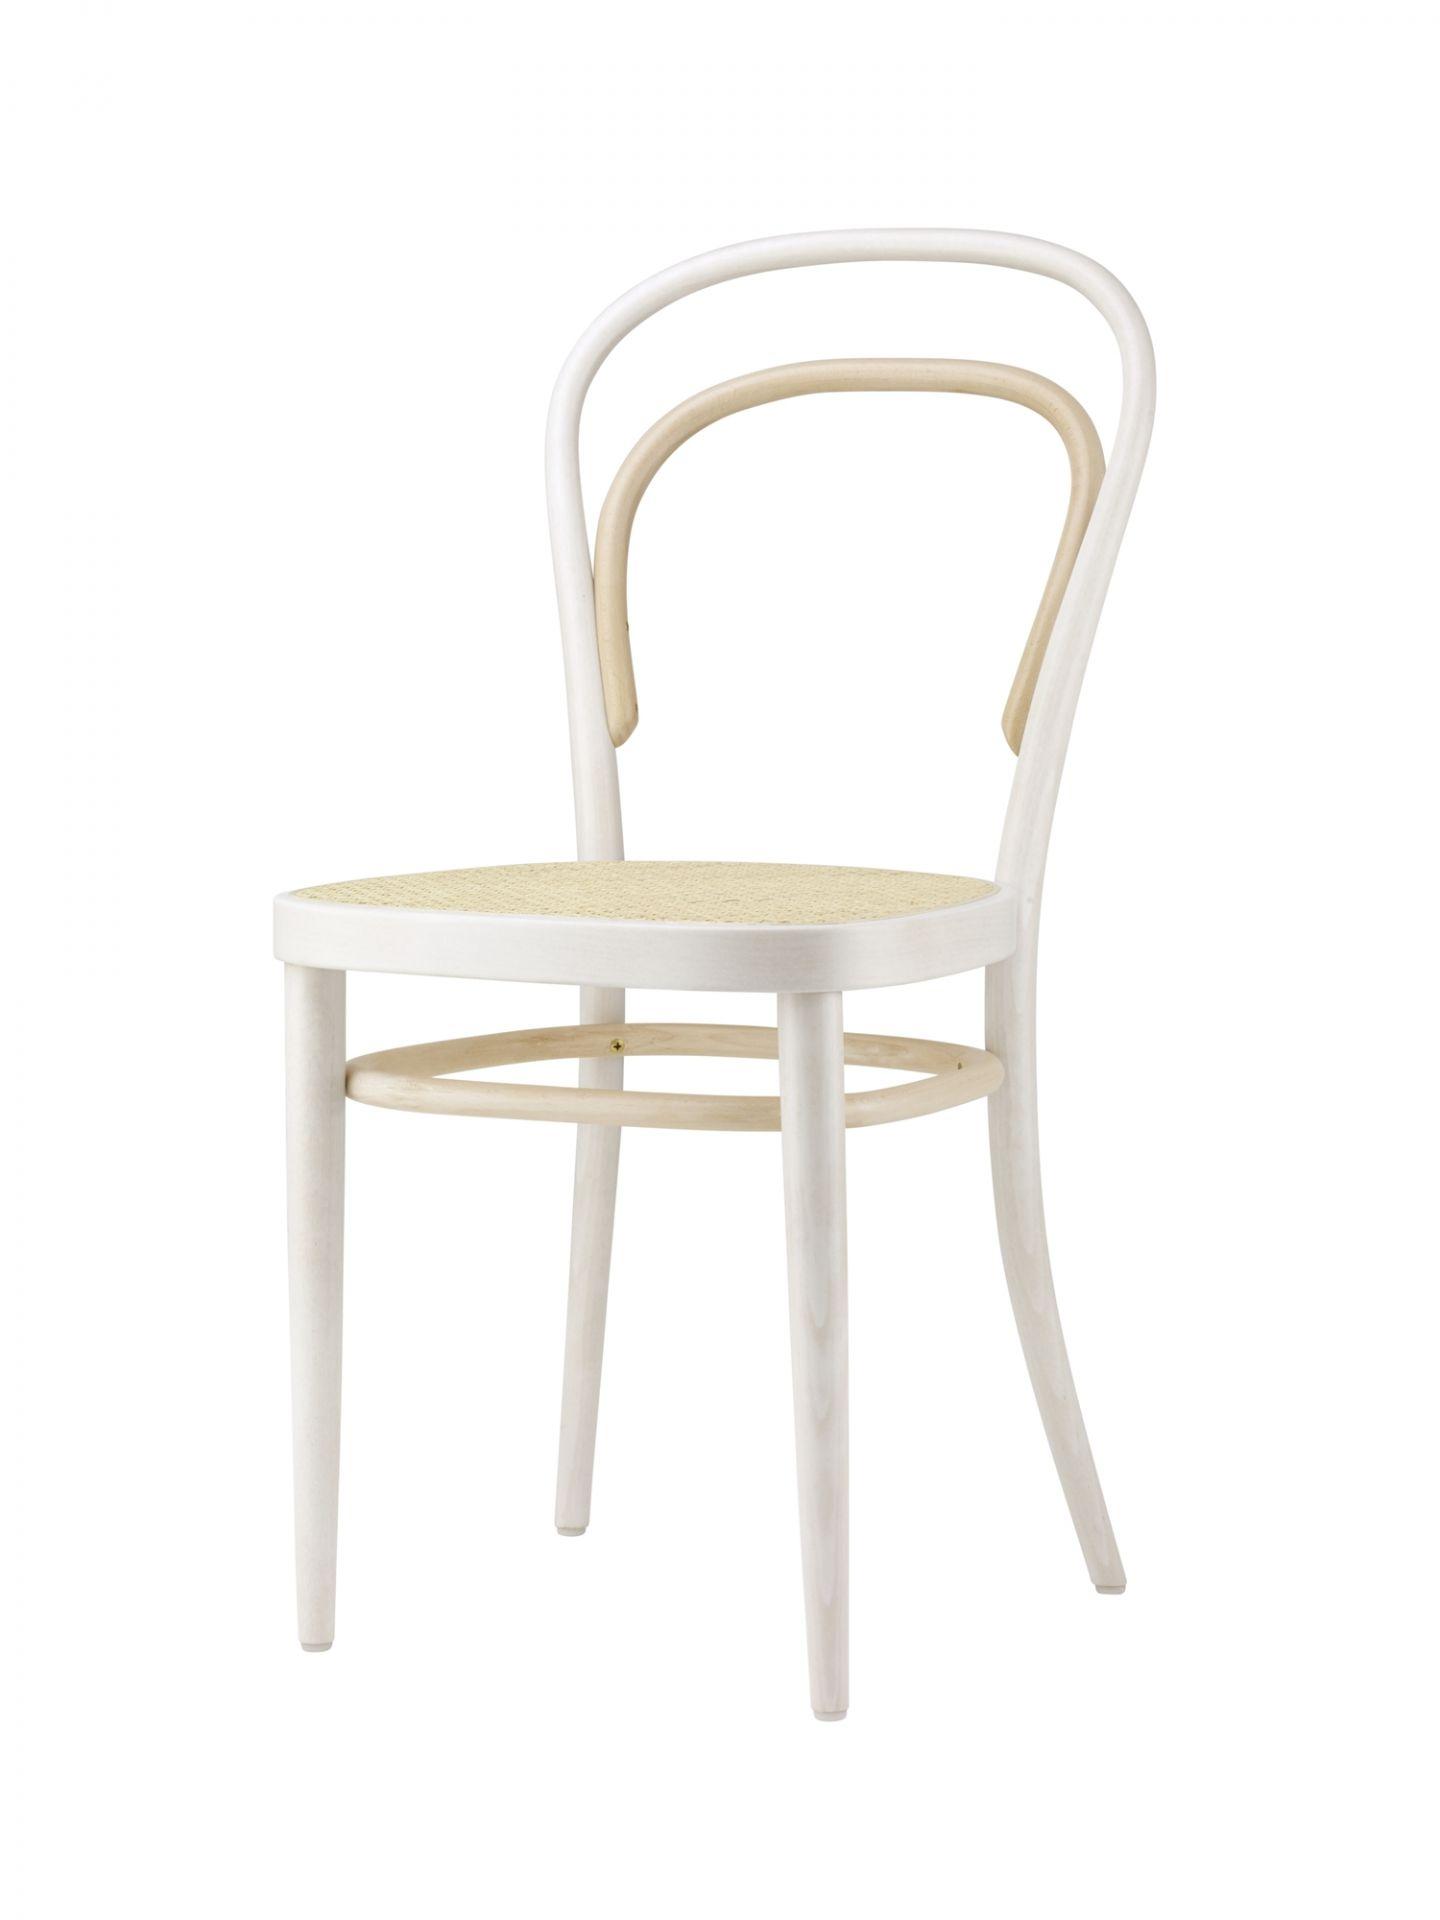 214 Two-Tone Coffee House Chair Thonet White